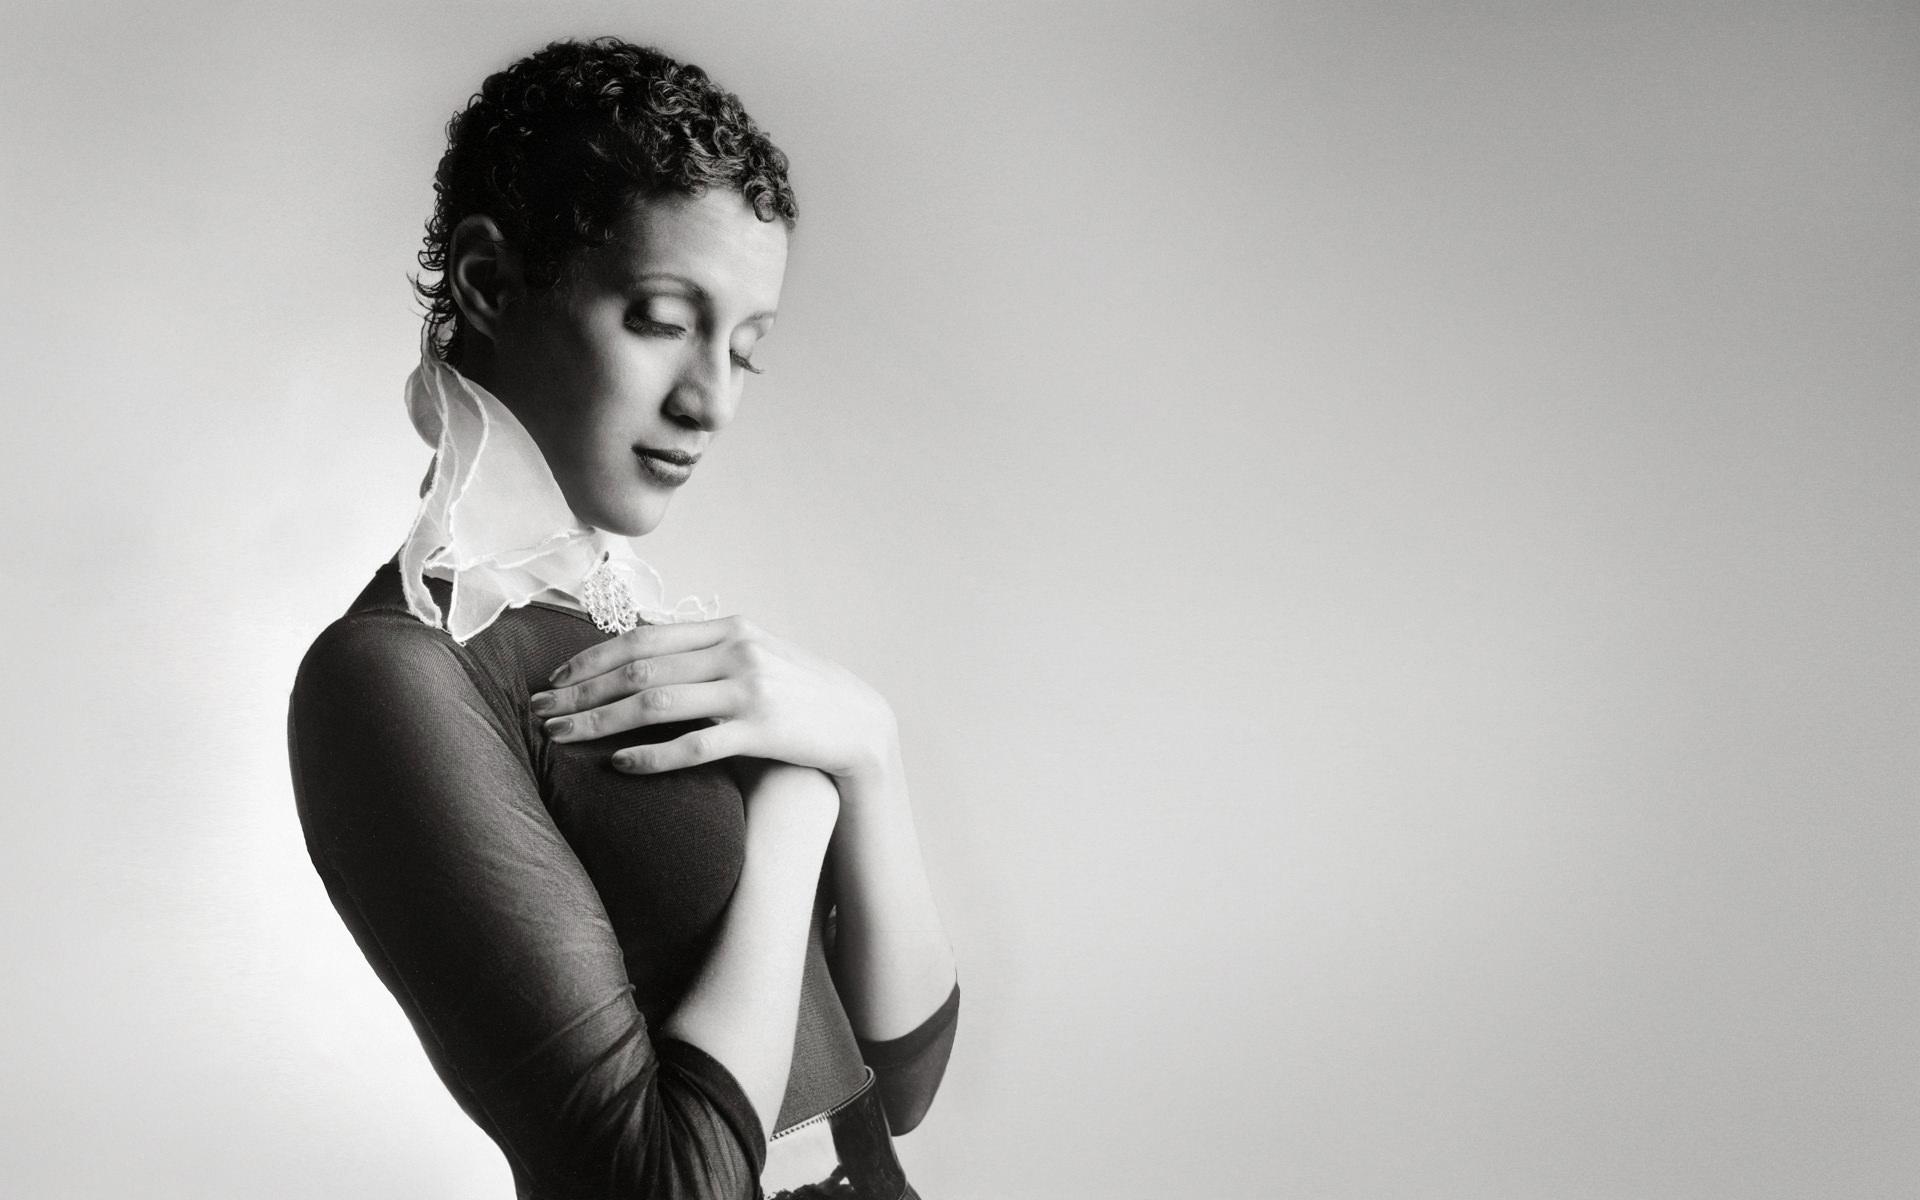 Marta-Hewson-Amanda-collar-Fashion.JPG